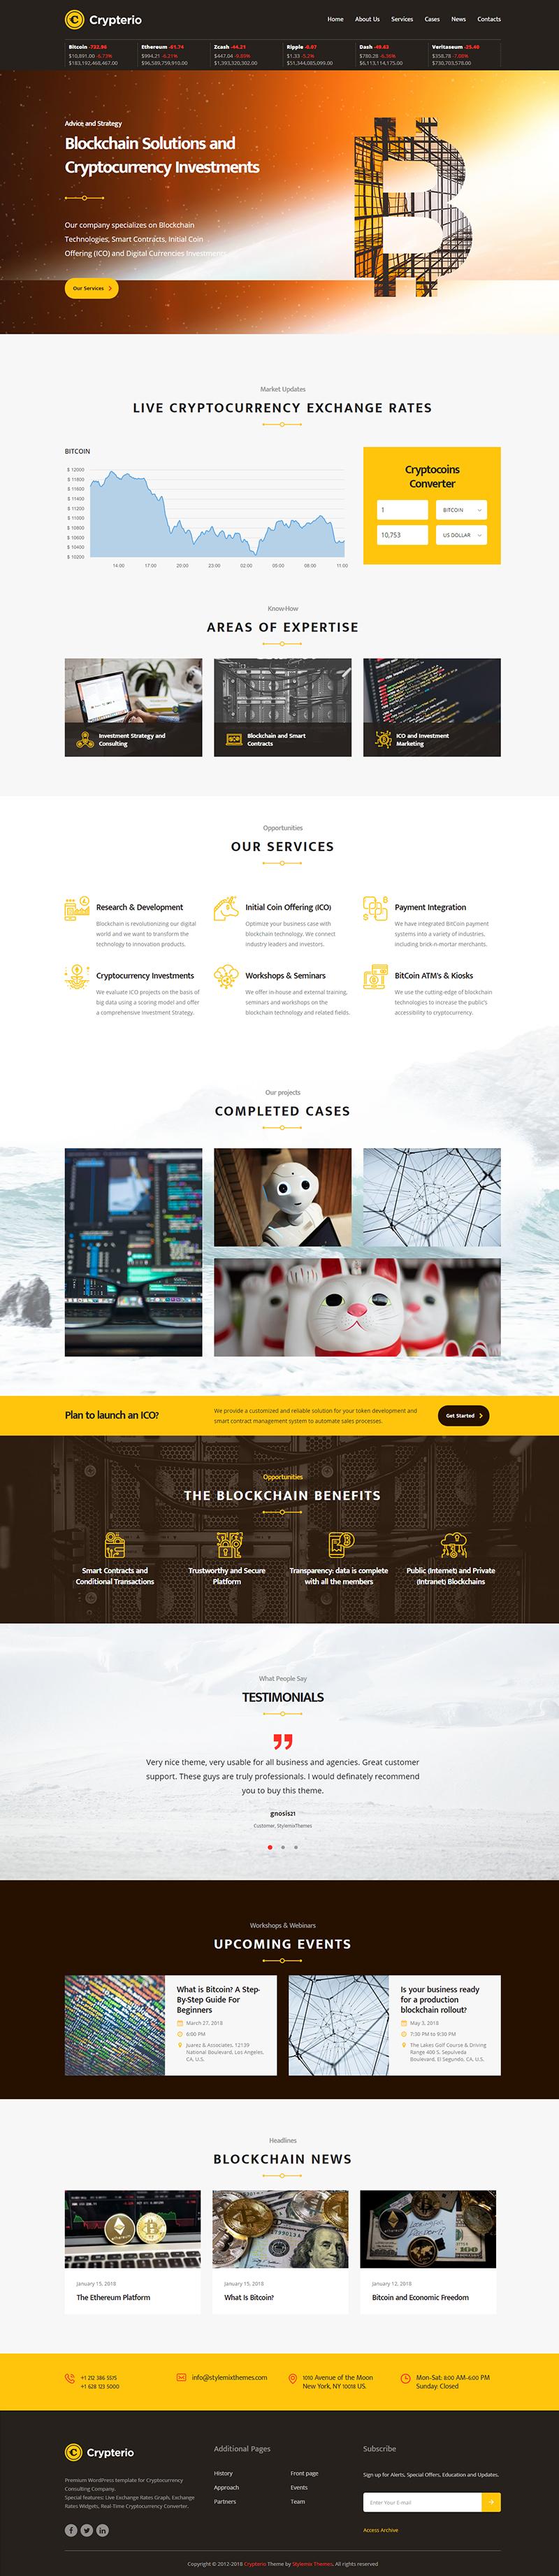 Introduction - Crypterio Theme Documentation